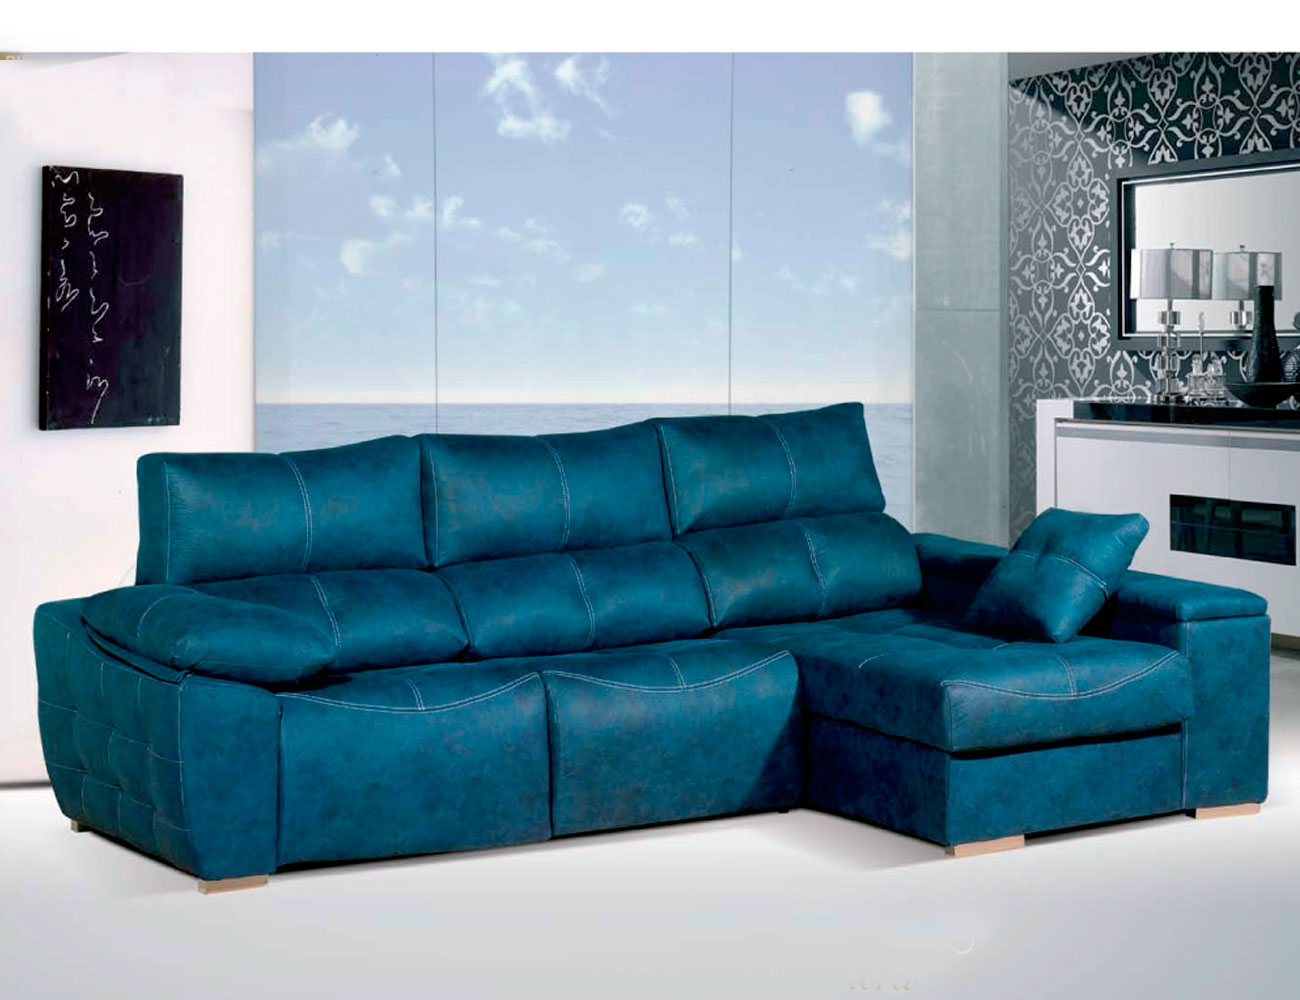 Sofa chaiselongue relax 2 motores anti manchas turquesa52